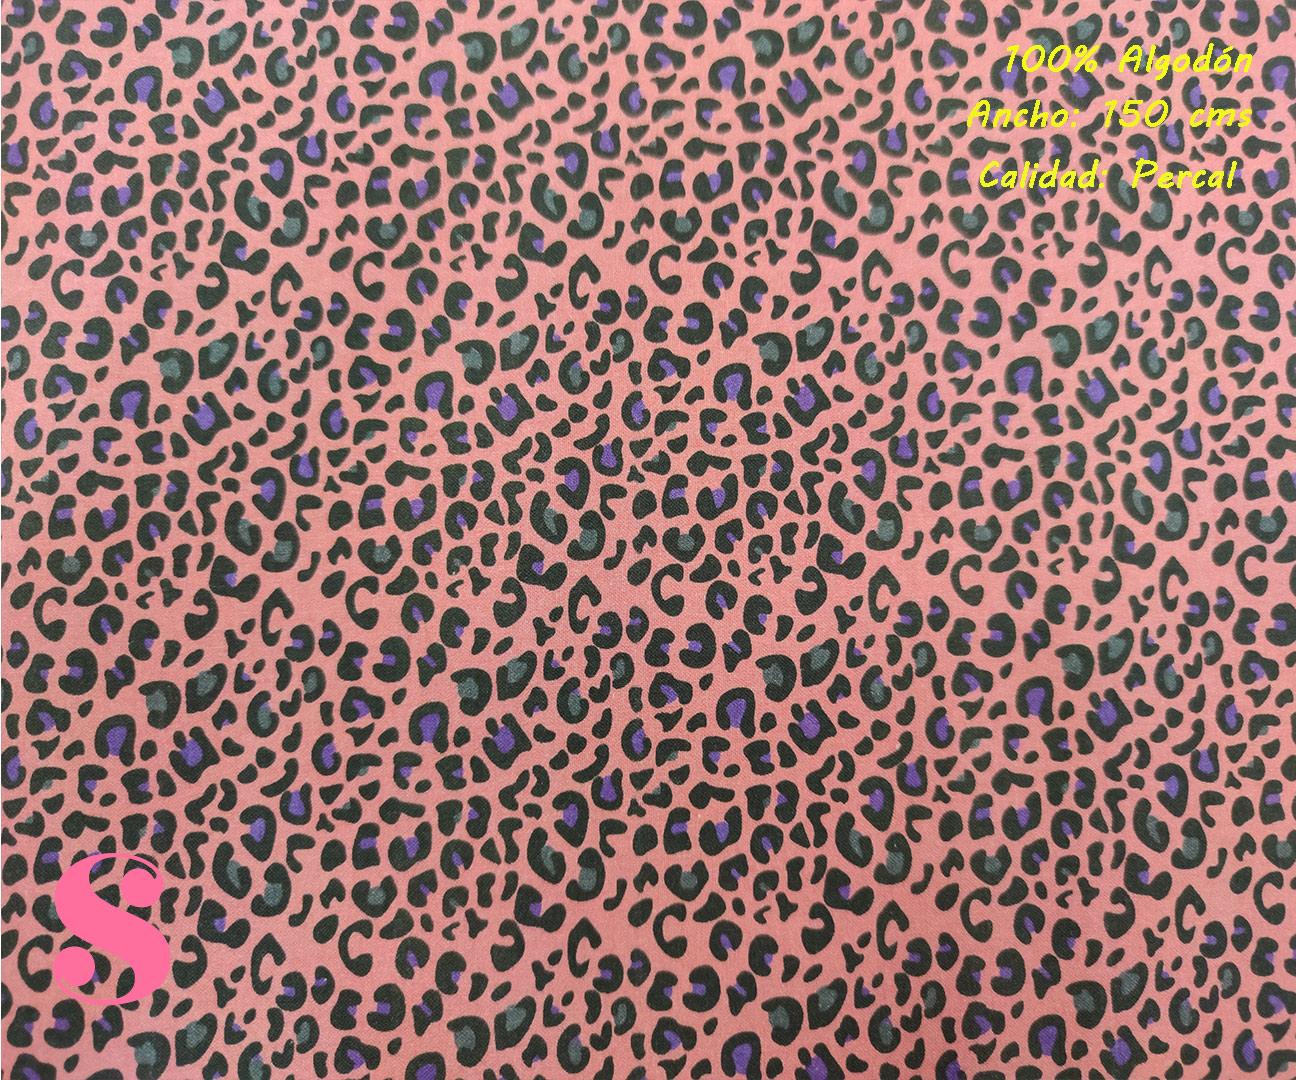 628-manchas-morado-animal-print-leopardo-tejidos-algodón-estampado-percal,Tejido Estampado Animal Print Rosa Mancha Morada,Estampado Leopardo Multicolor